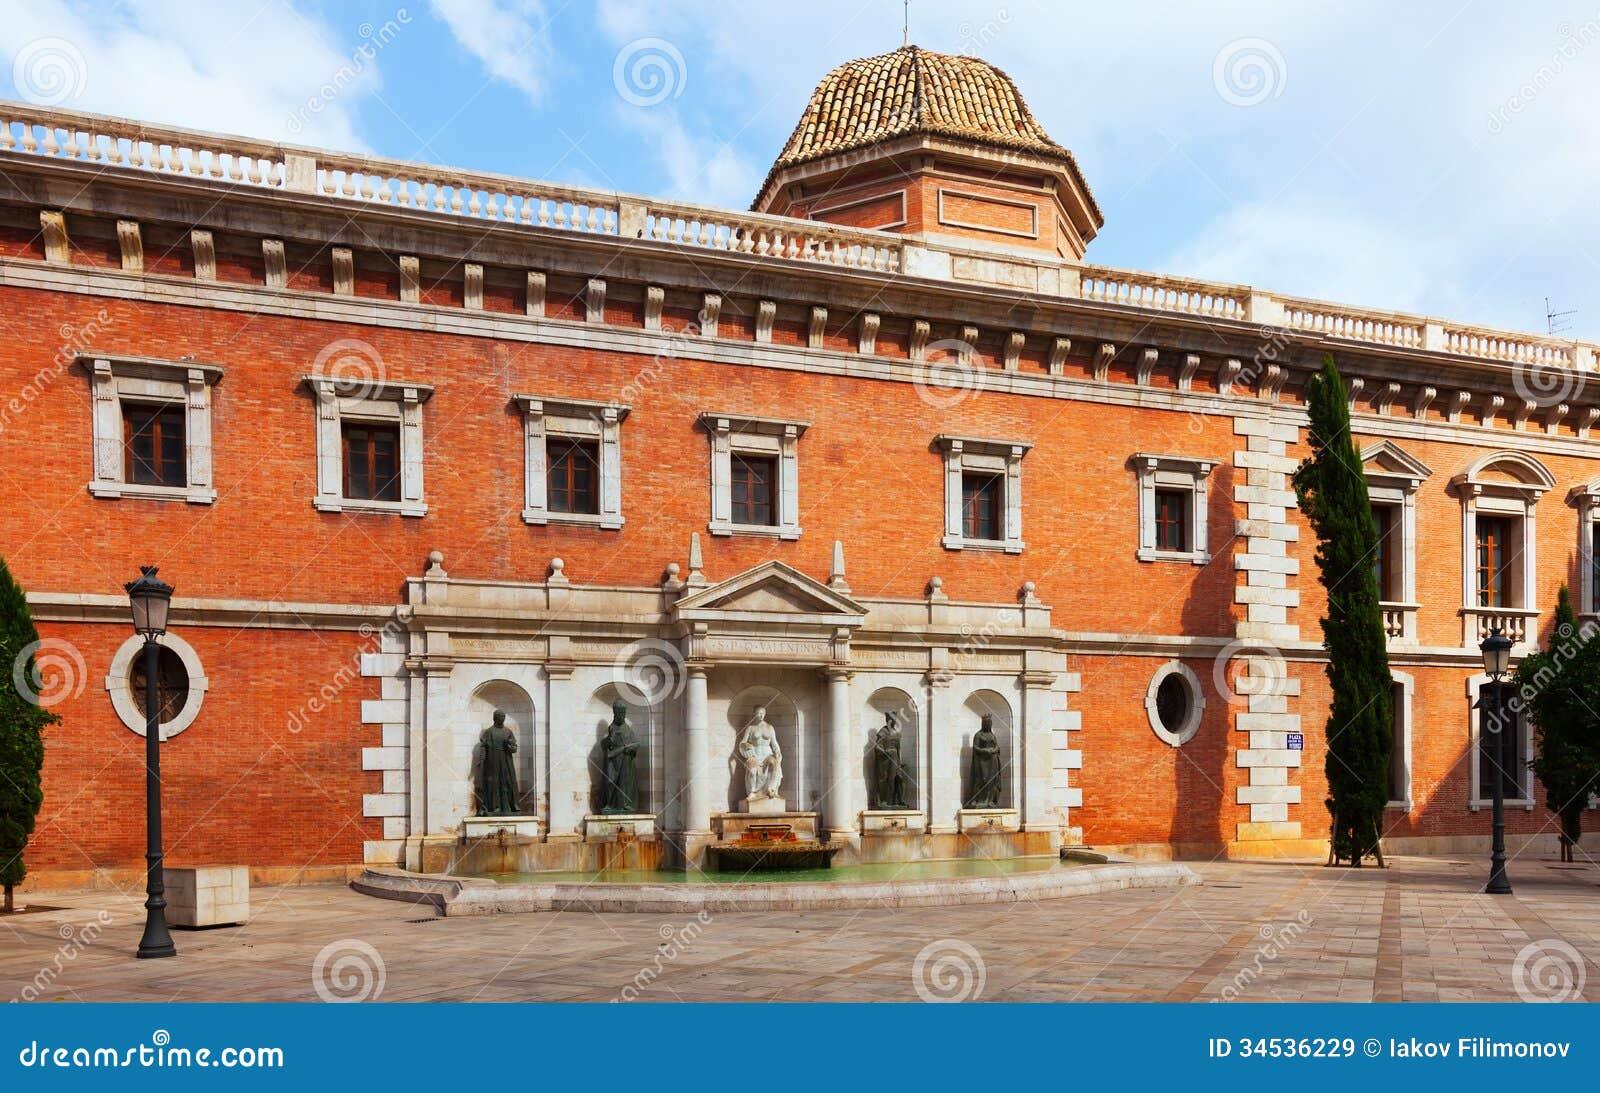 Plaza Colegio Del Patriarca In Valencia. Spain Royalty Free Stock Images - Im...